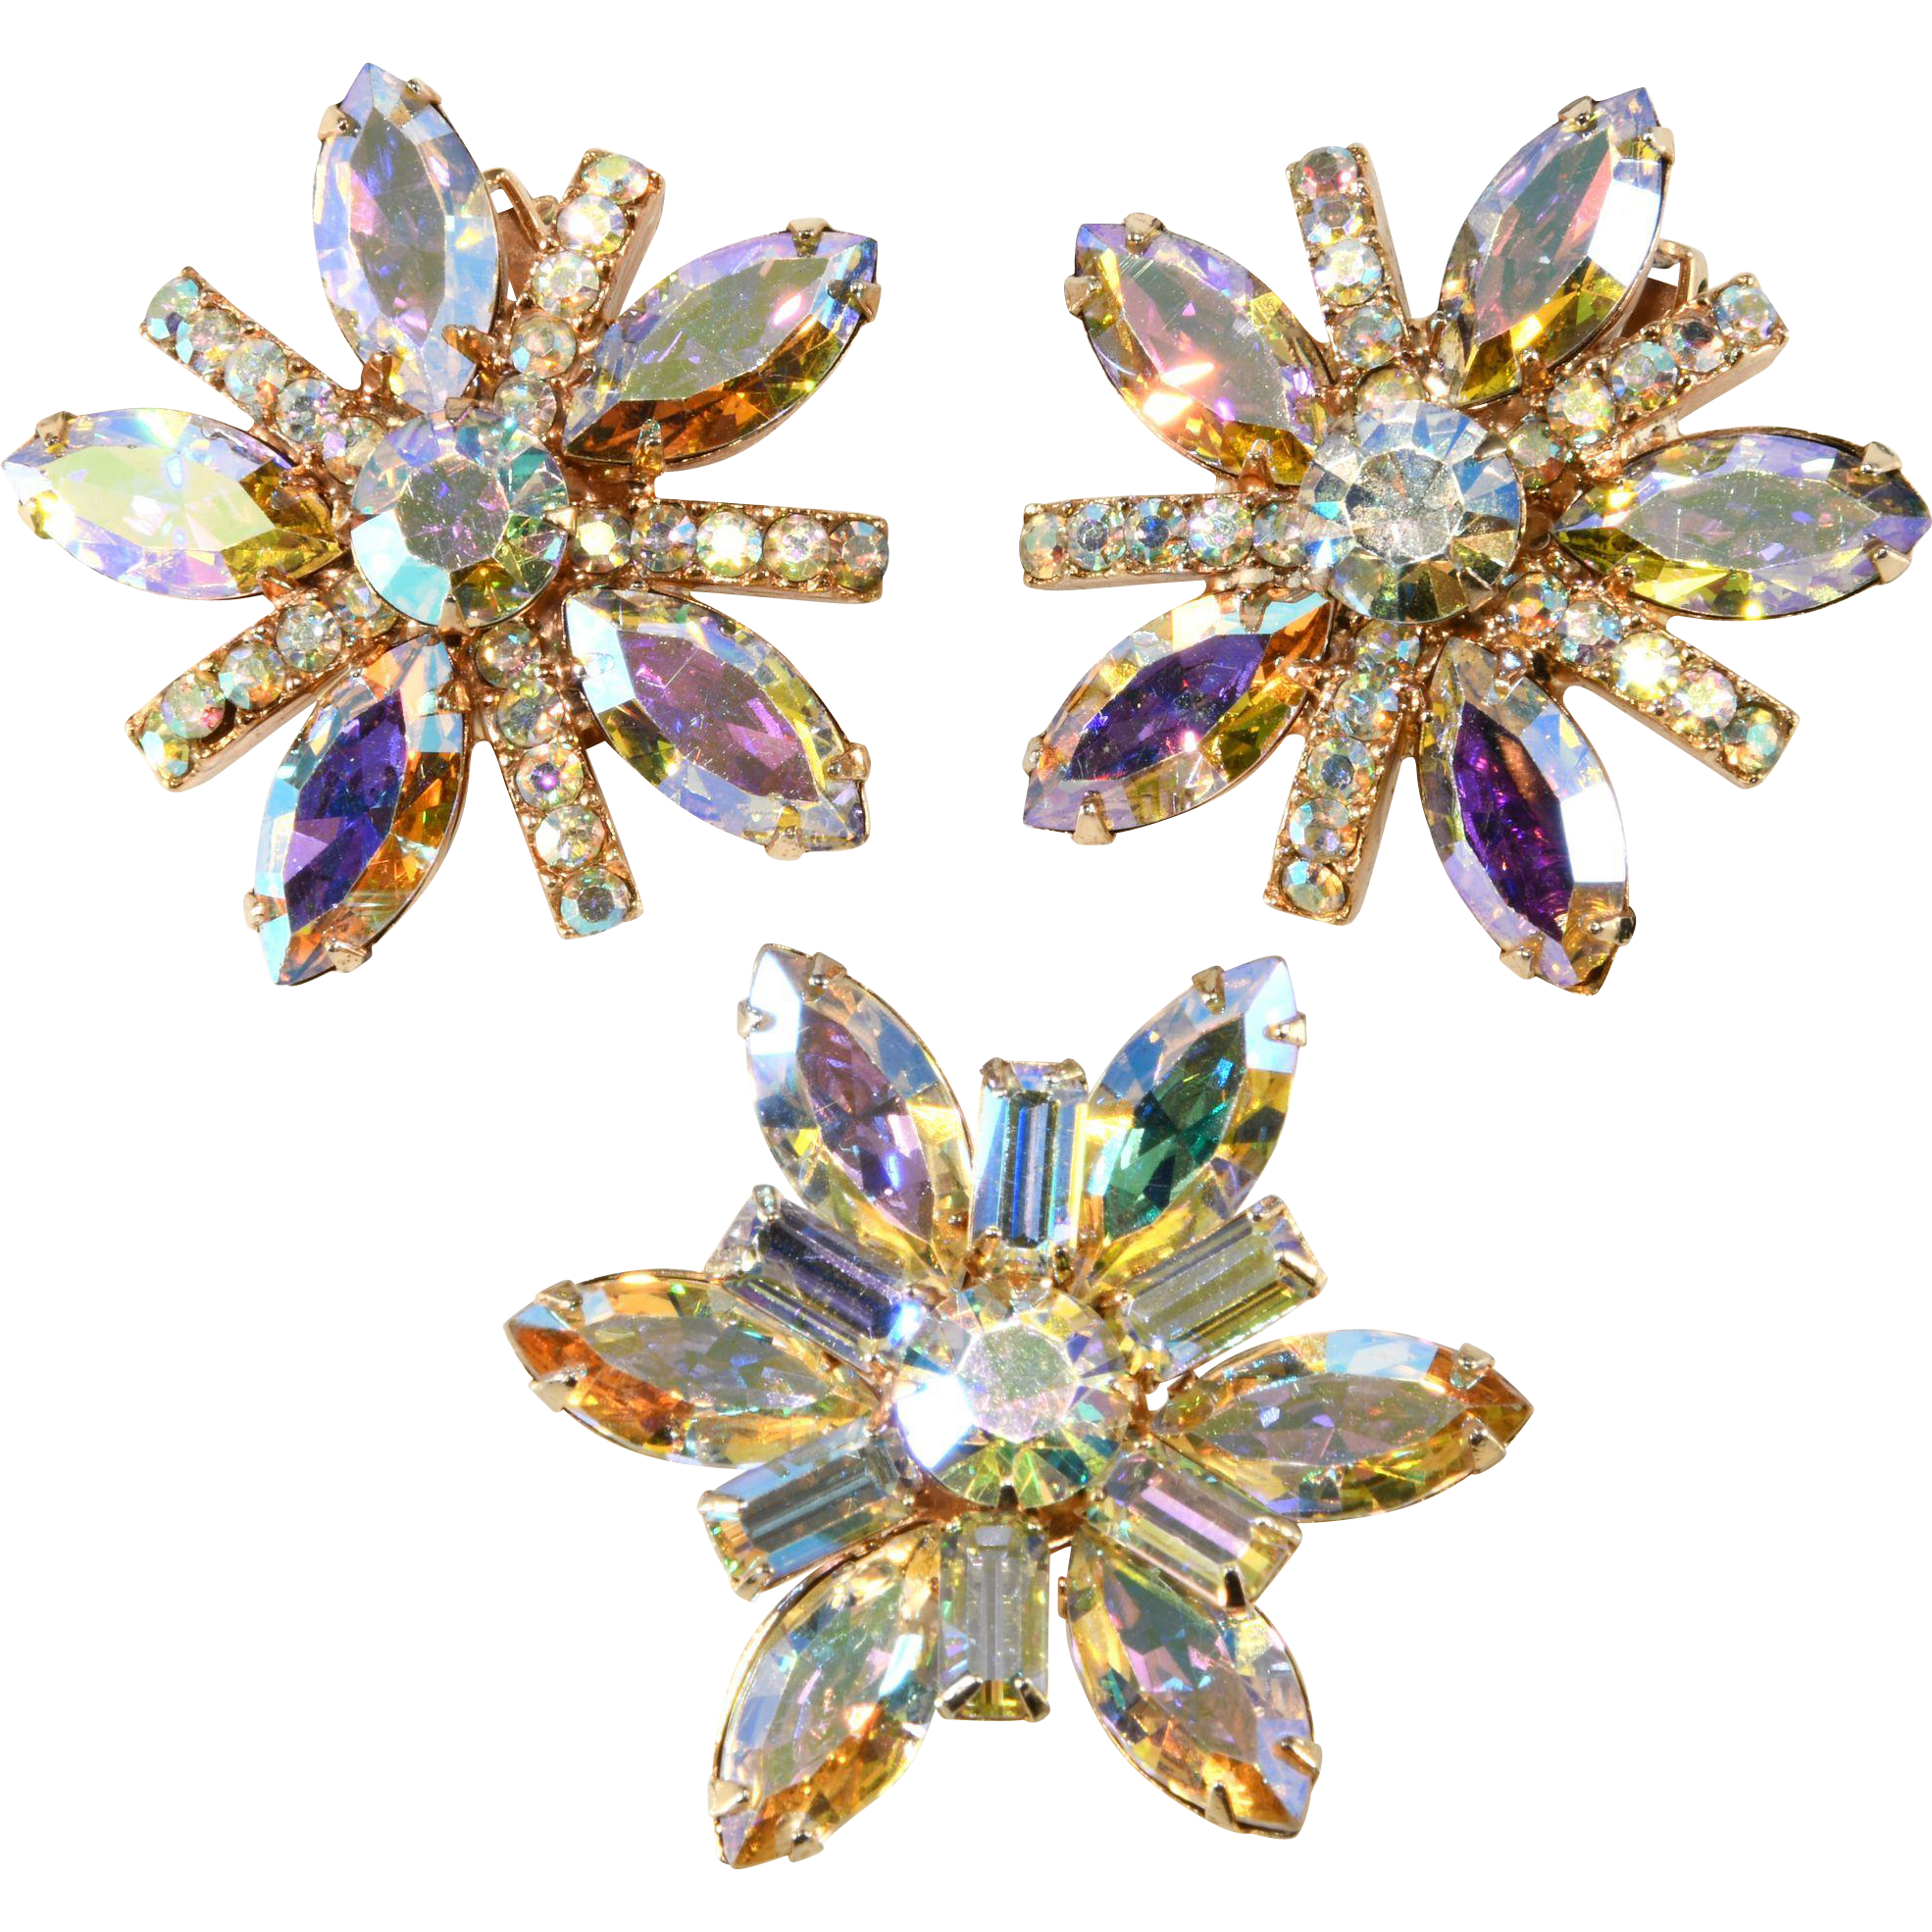 3 Piece Set Brooch and Earrings Aurora Borealis Iridescent Rhinestones